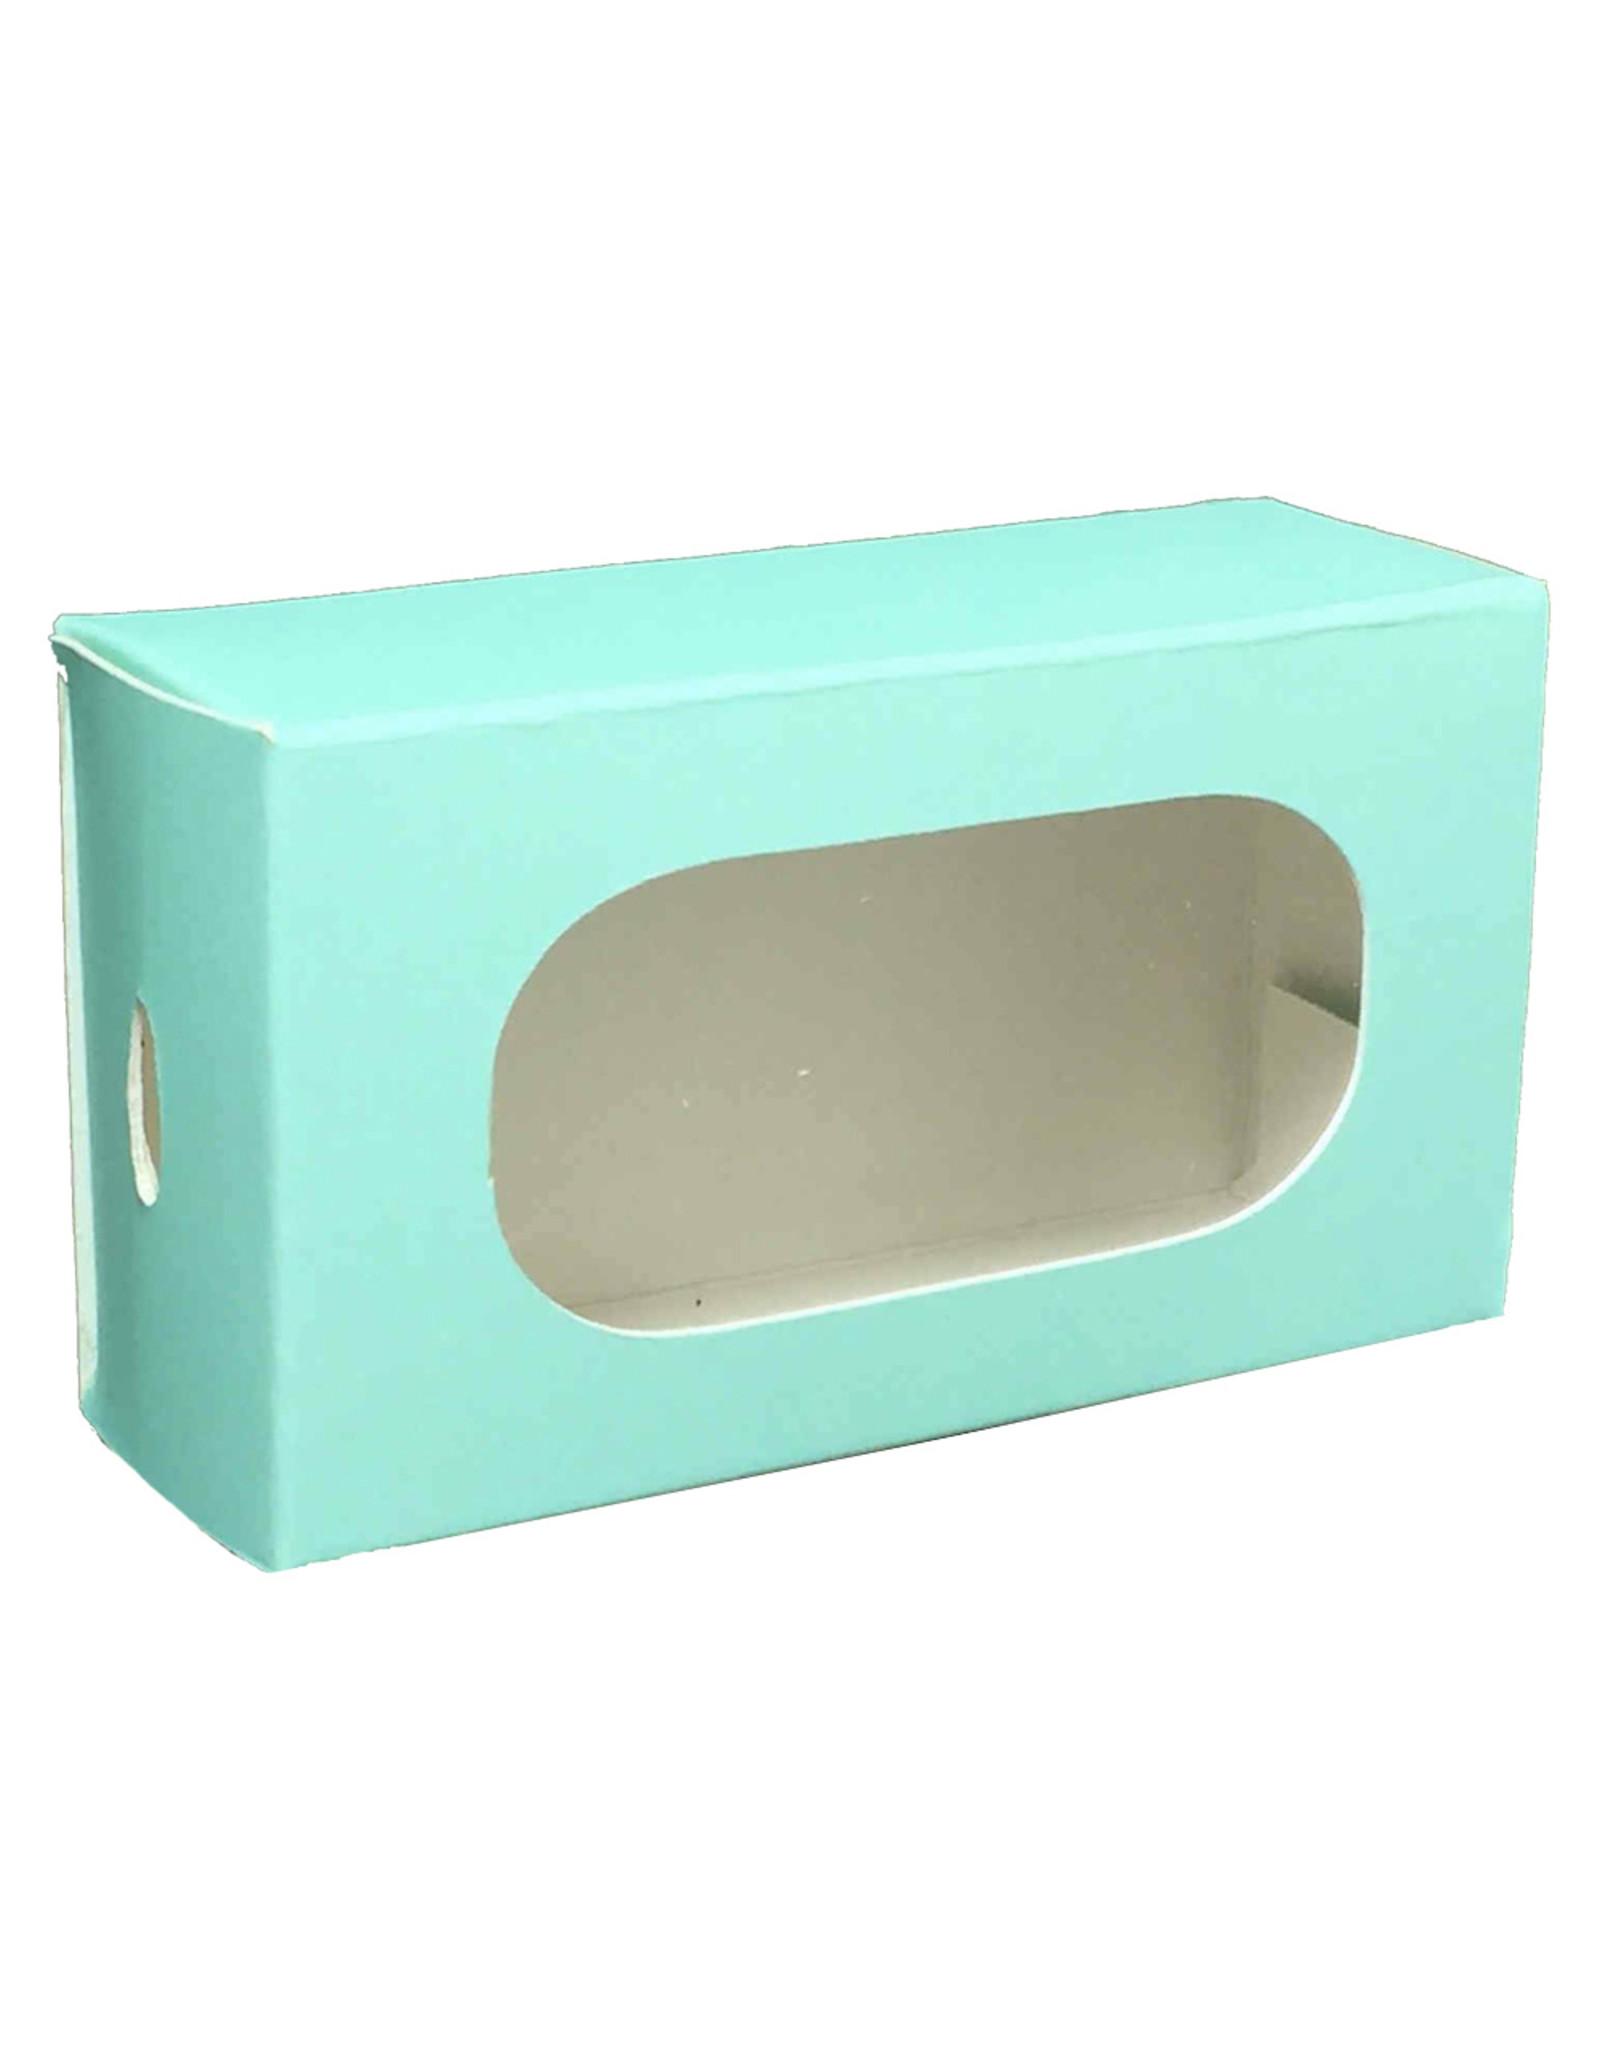 Doosjes voor cakesicle - 5 x 9 x 3 cm (10 stuks)